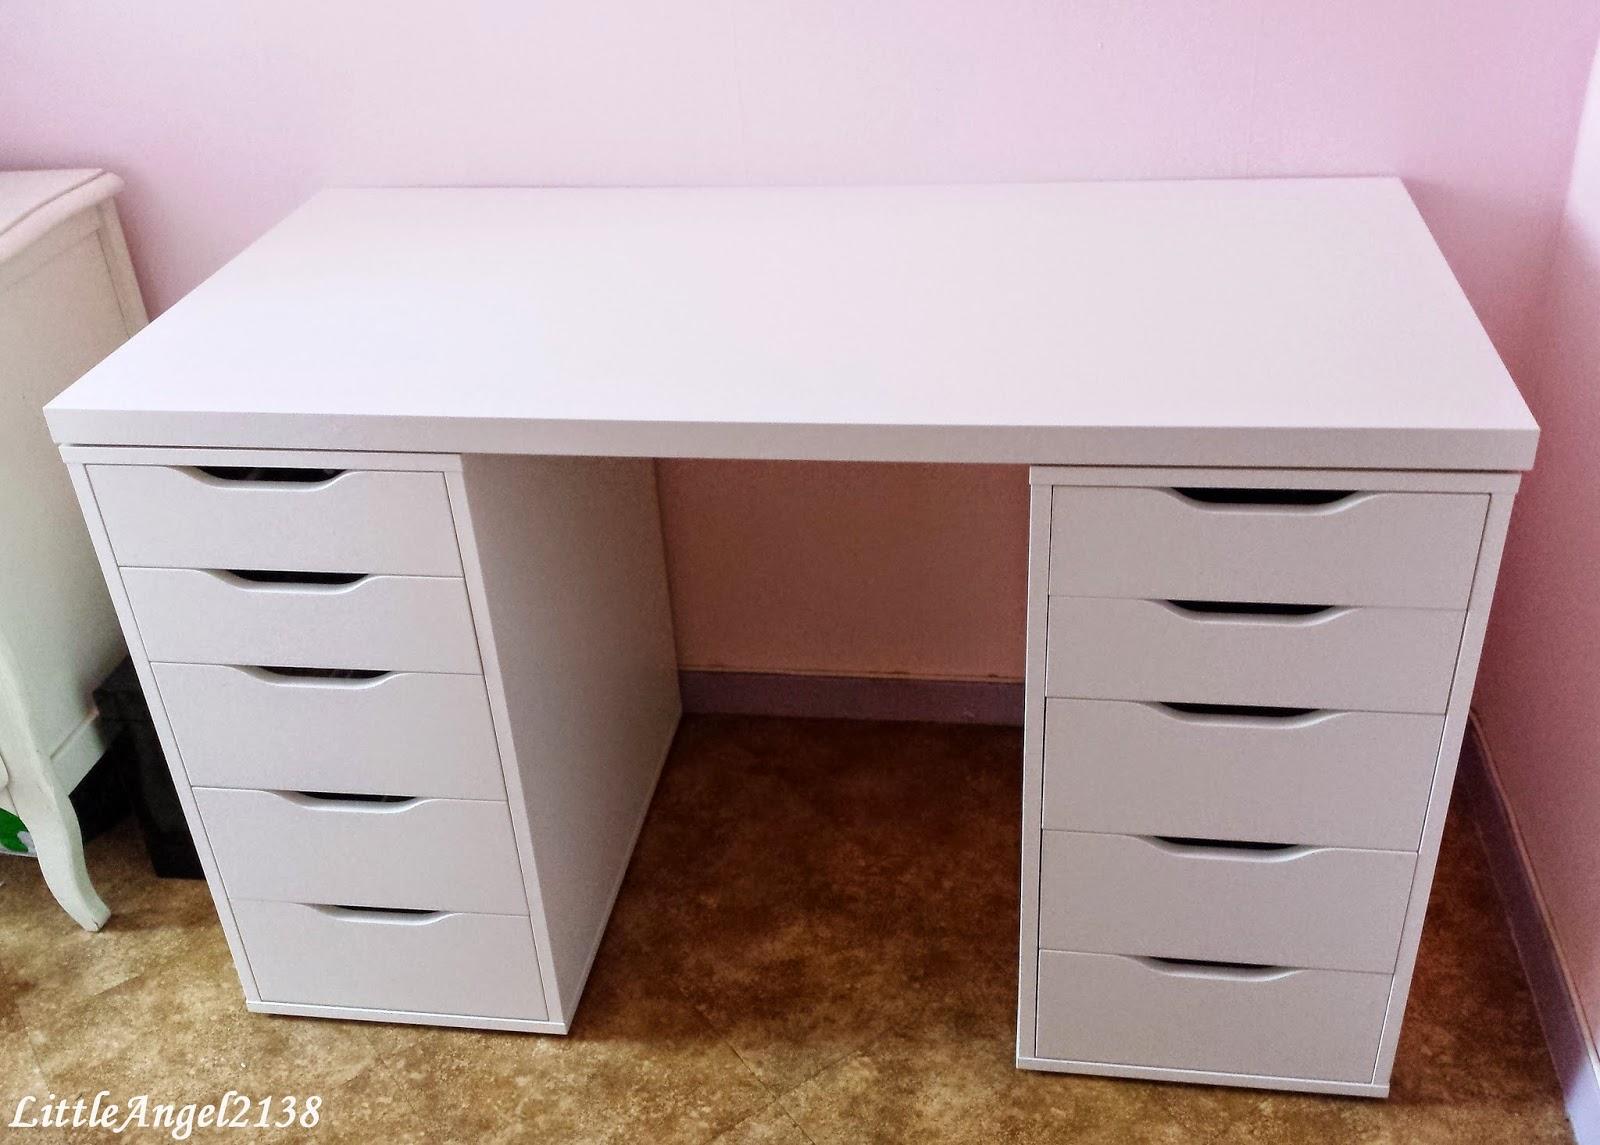 caisson a tiroir alex. Black Bedroom Furniture Sets. Home Design Ideas